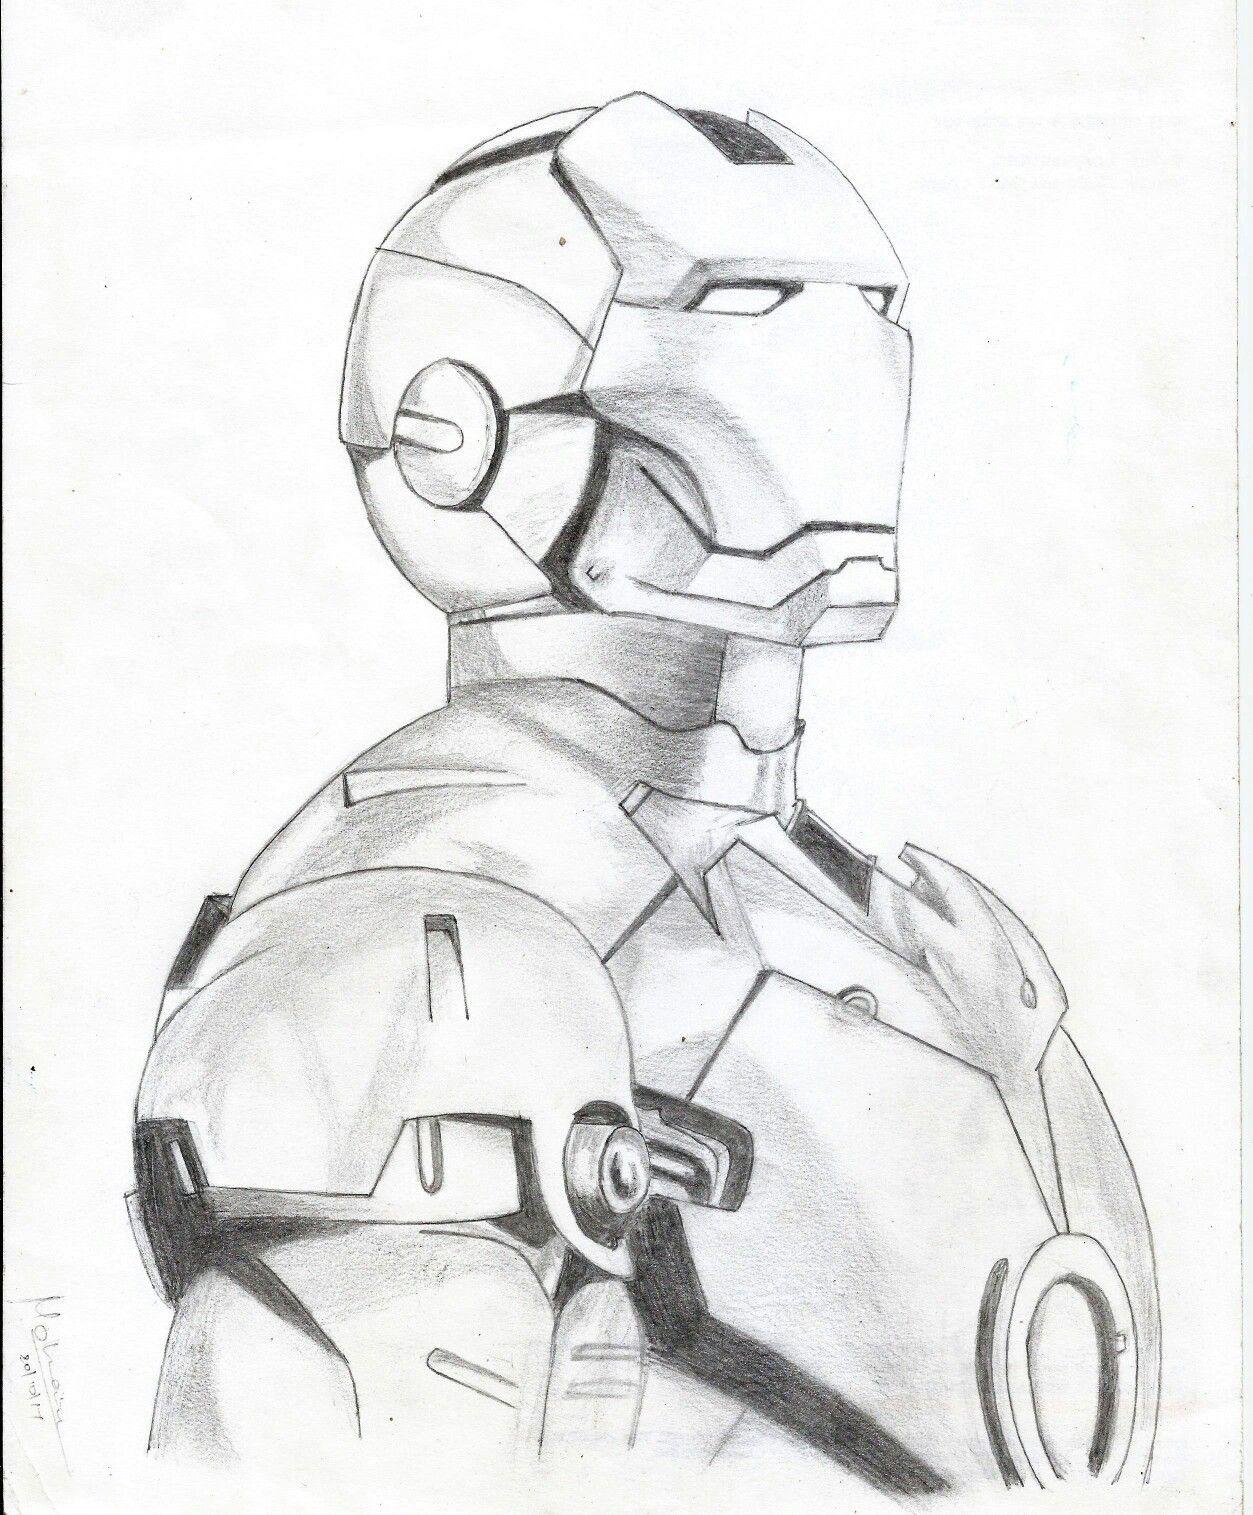 Iron man pencil sketch